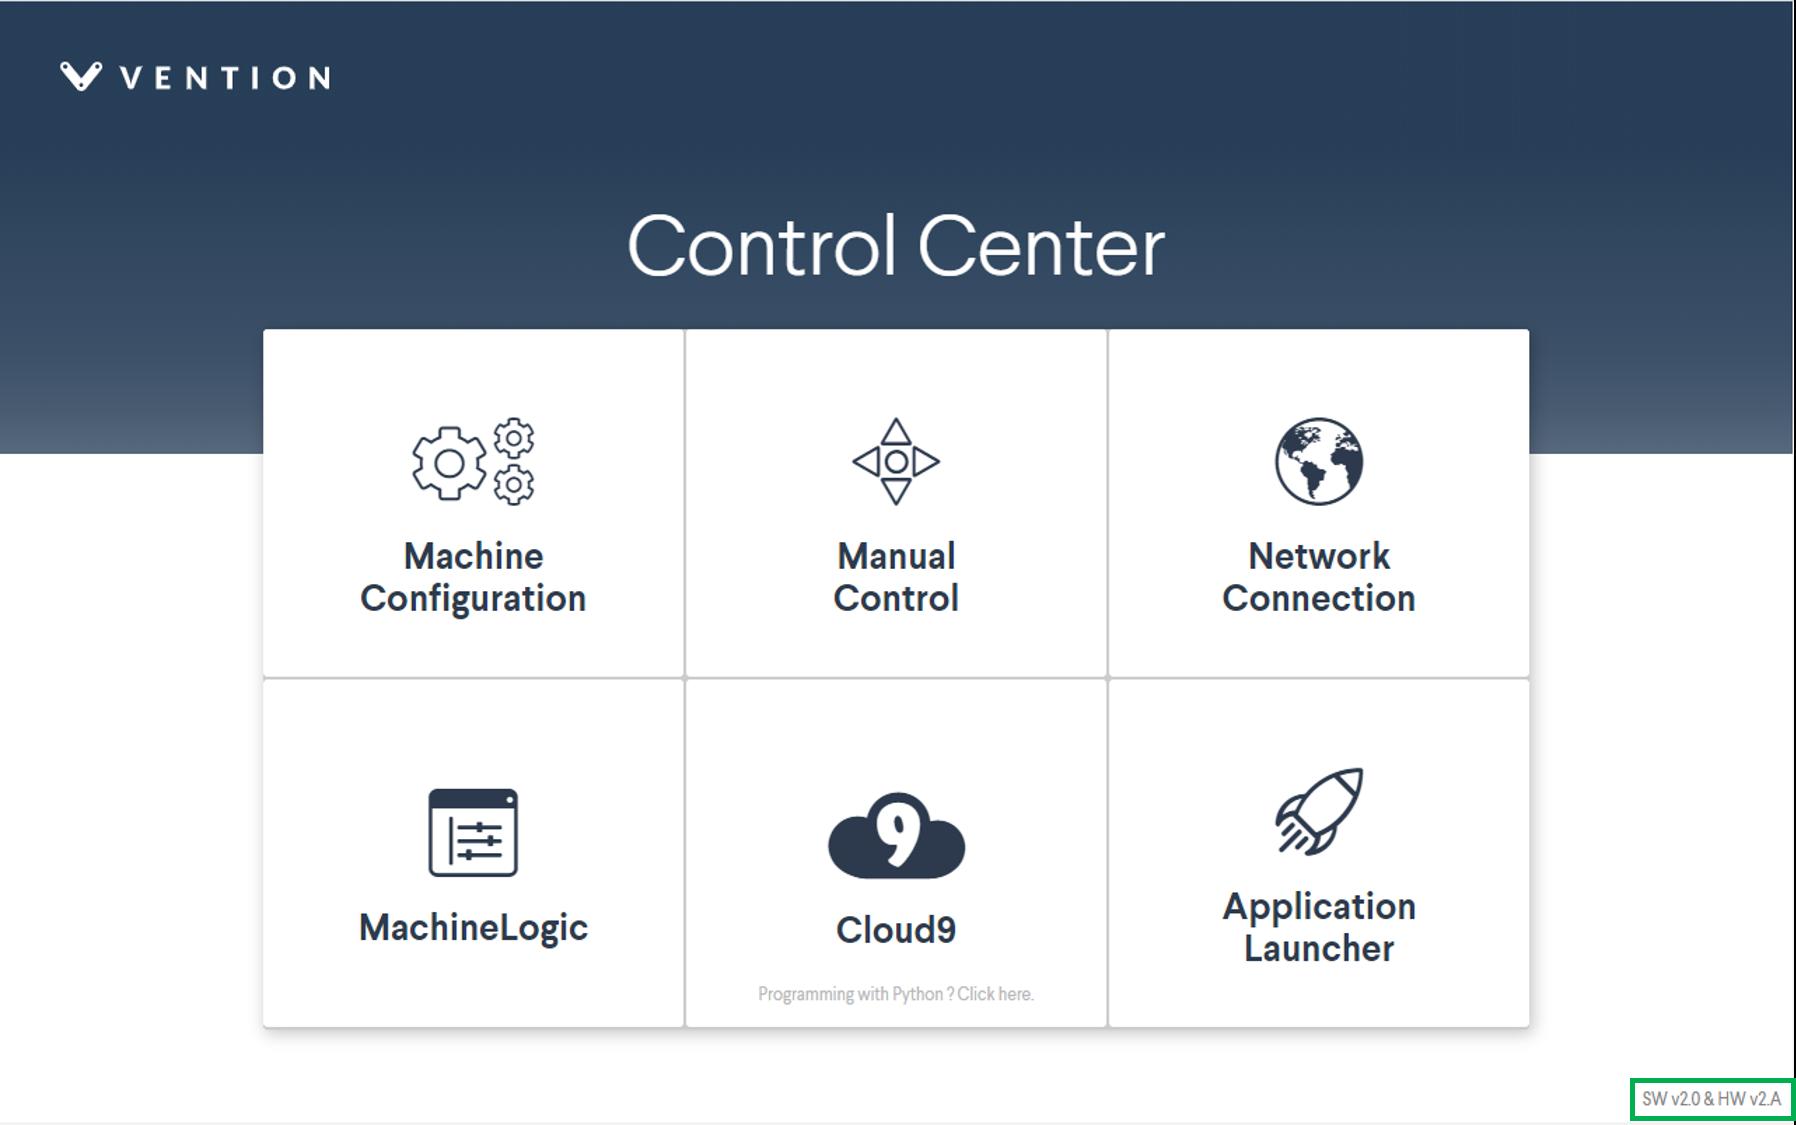 Figure 7: MachineMotion Control Center main page